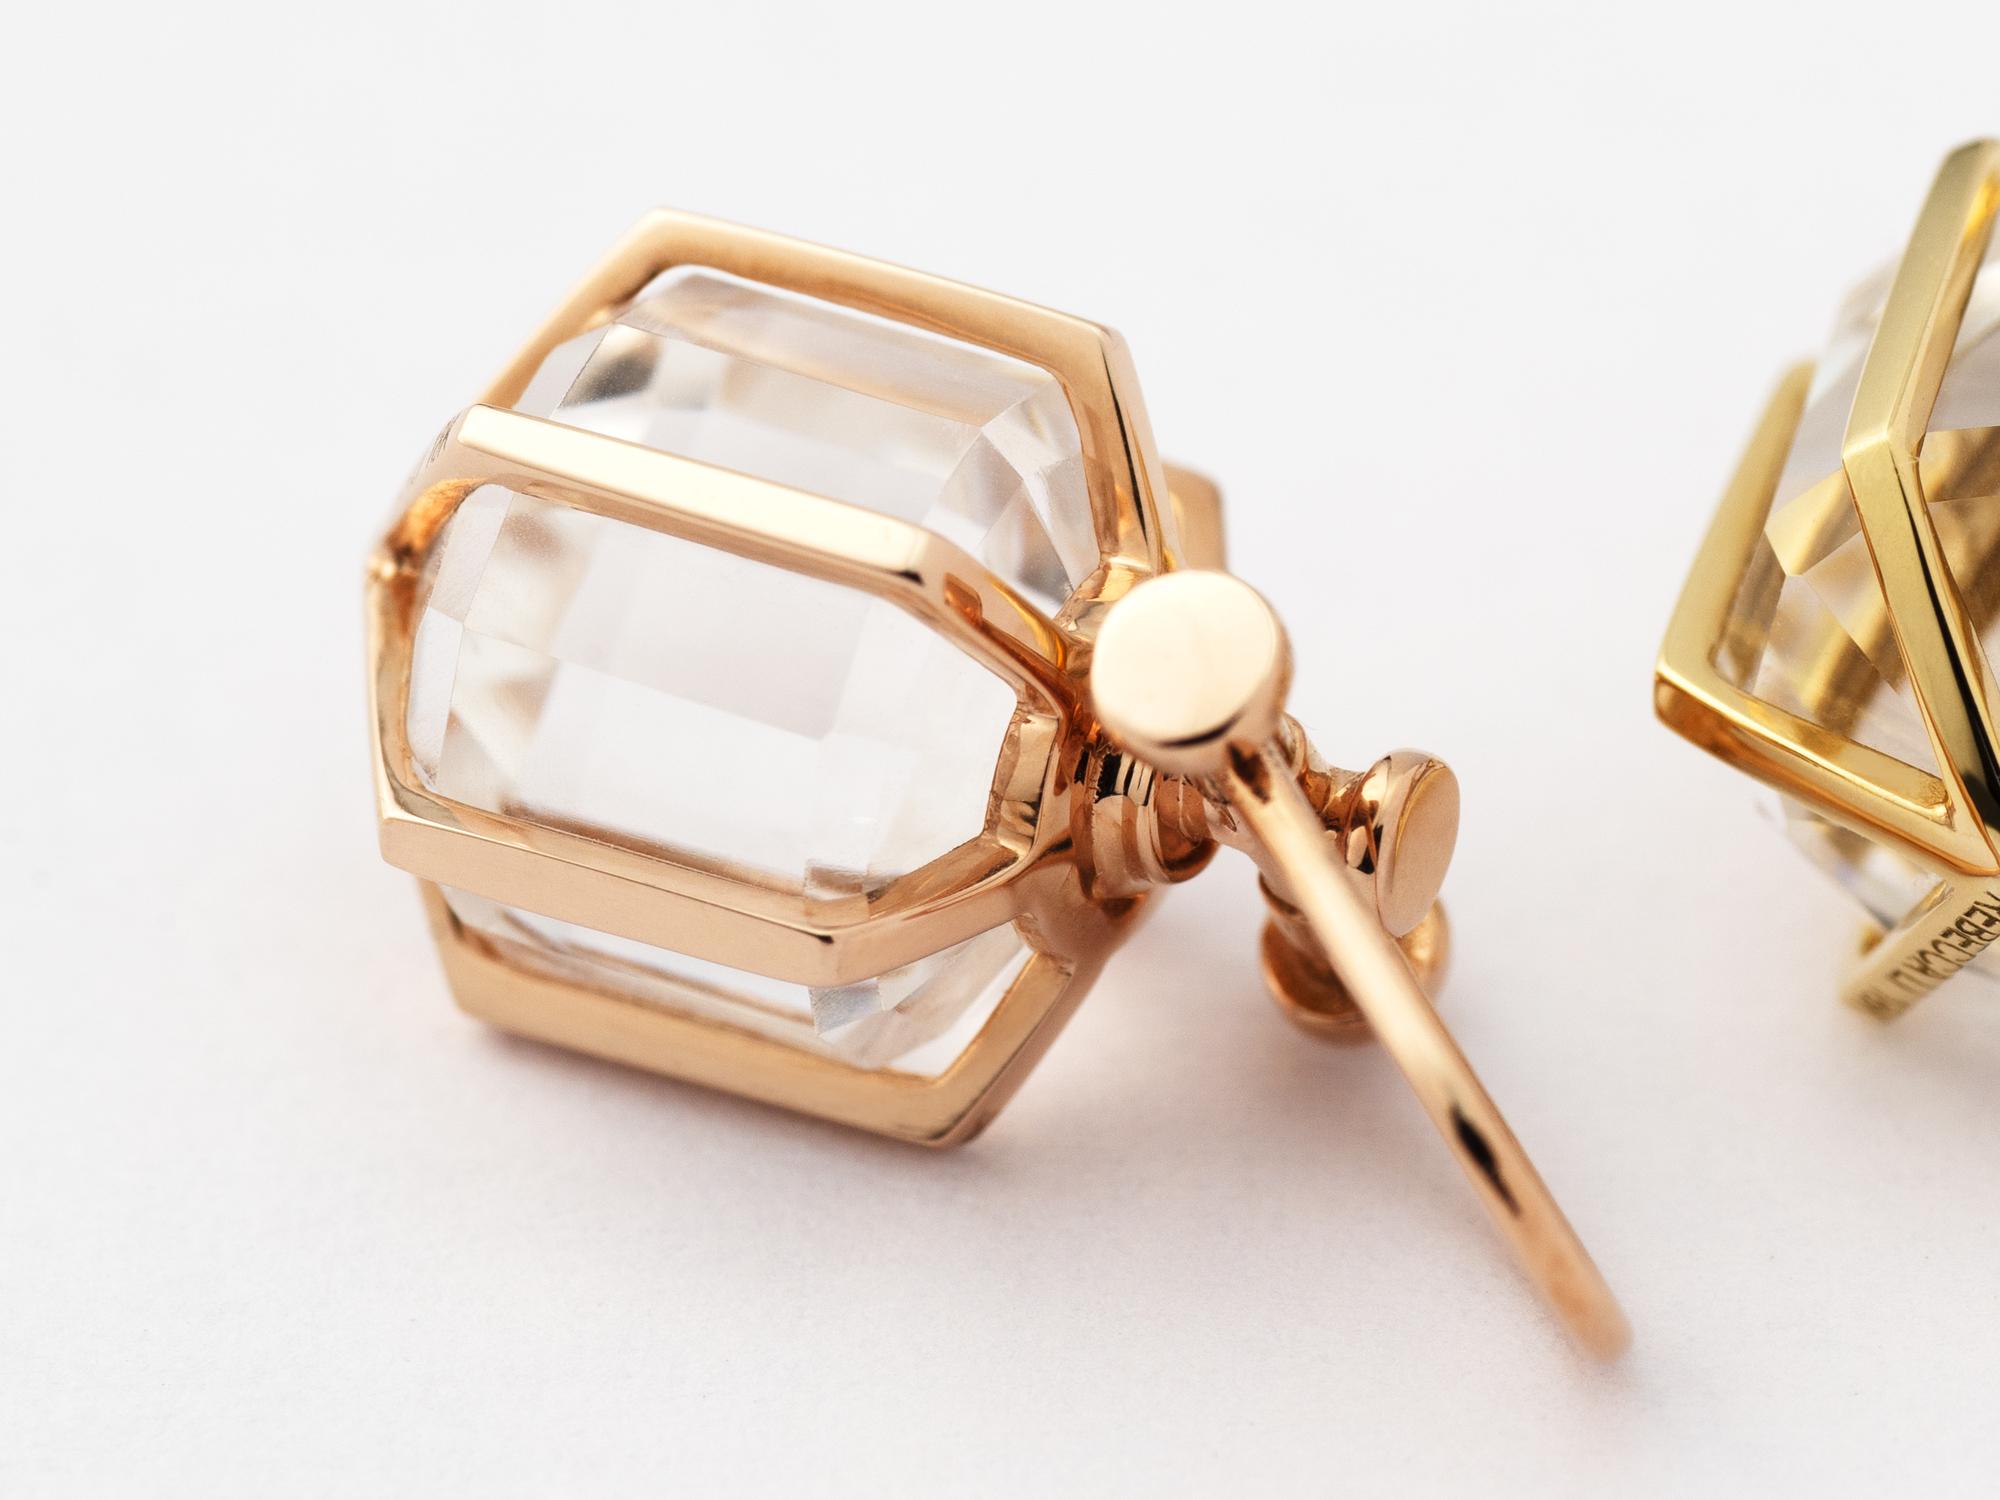 Rebecca Li Mini Six Senses Talisman Pendant Necklace, 18k solid rose gold, natural rock crystal, 12 sided crystal point